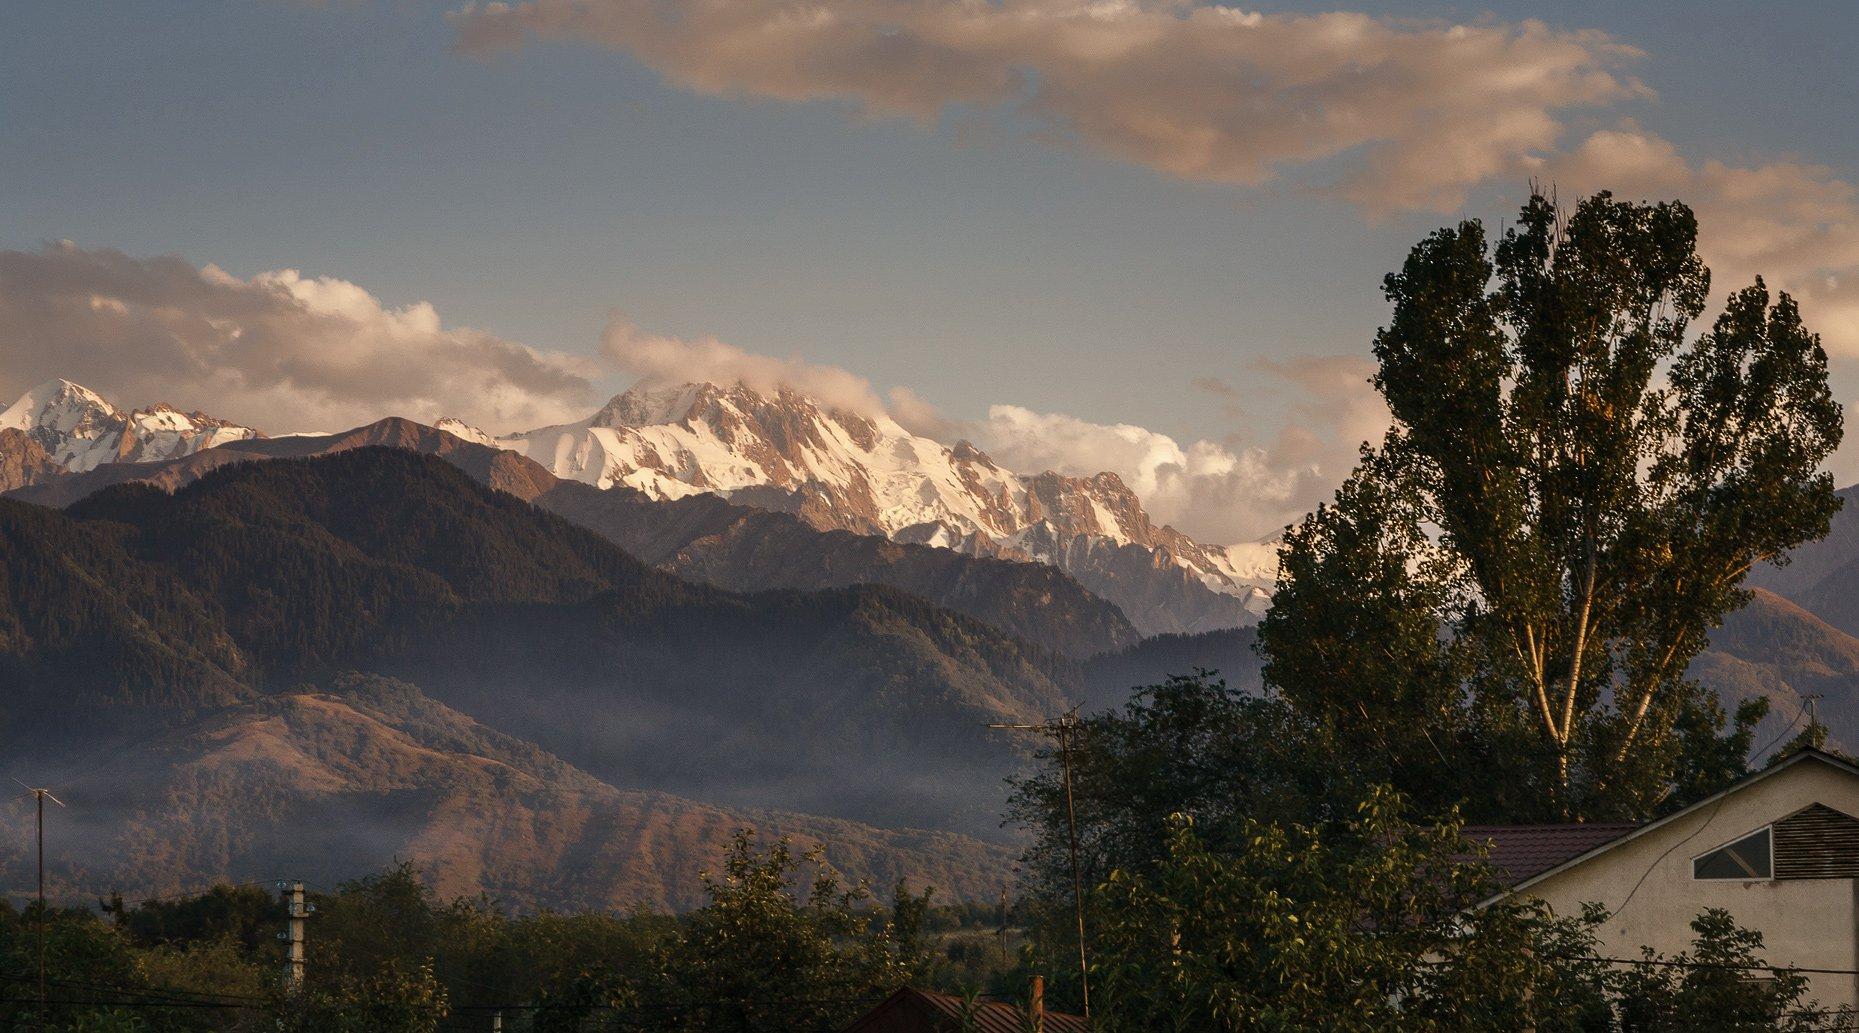 kazakhstan nature mountains талгар горы казахстан алма-ата, Vasca